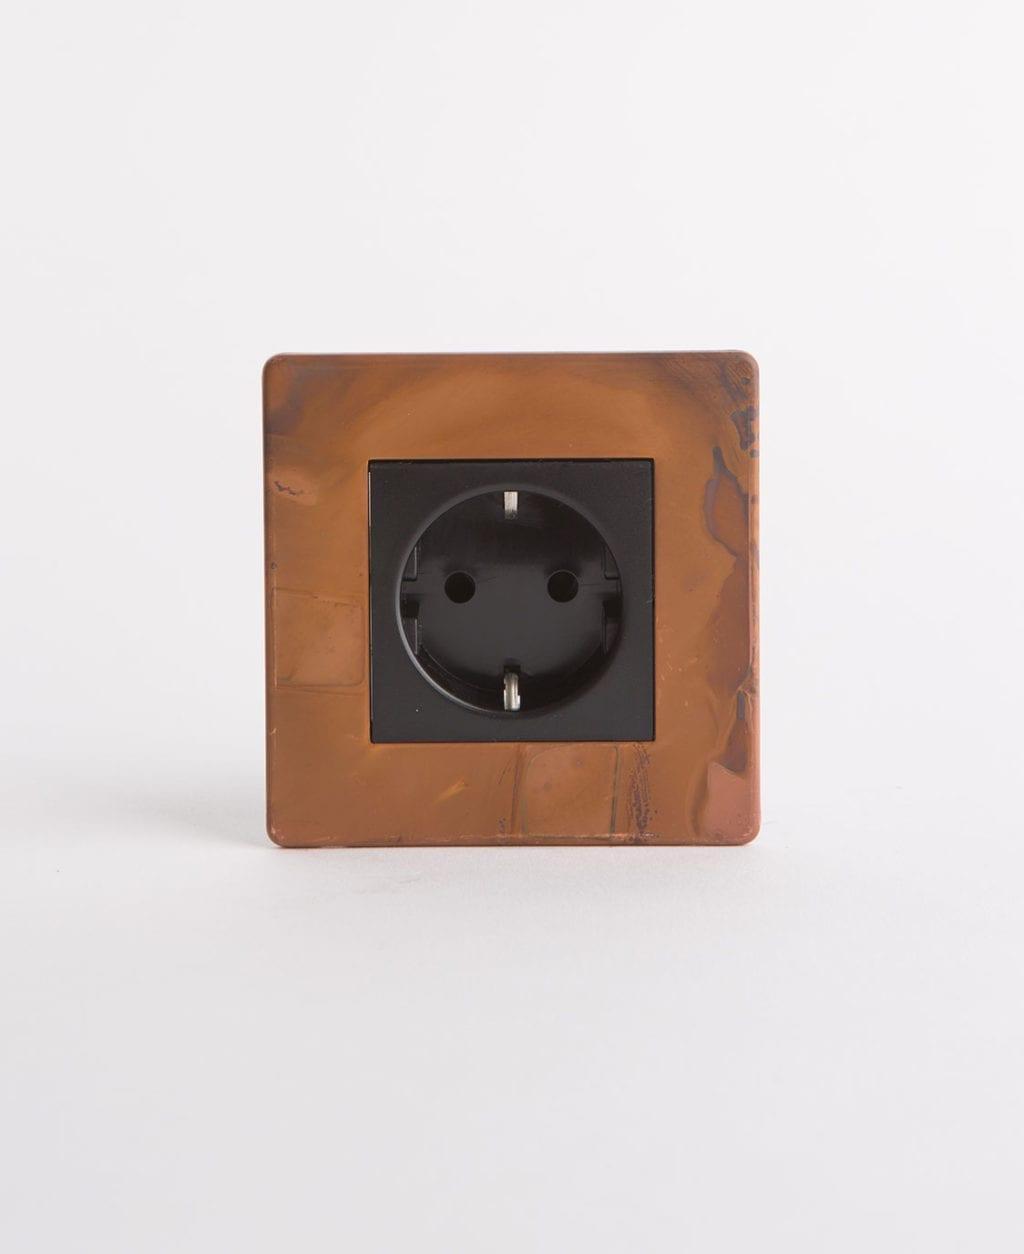 copper Schuko single socket